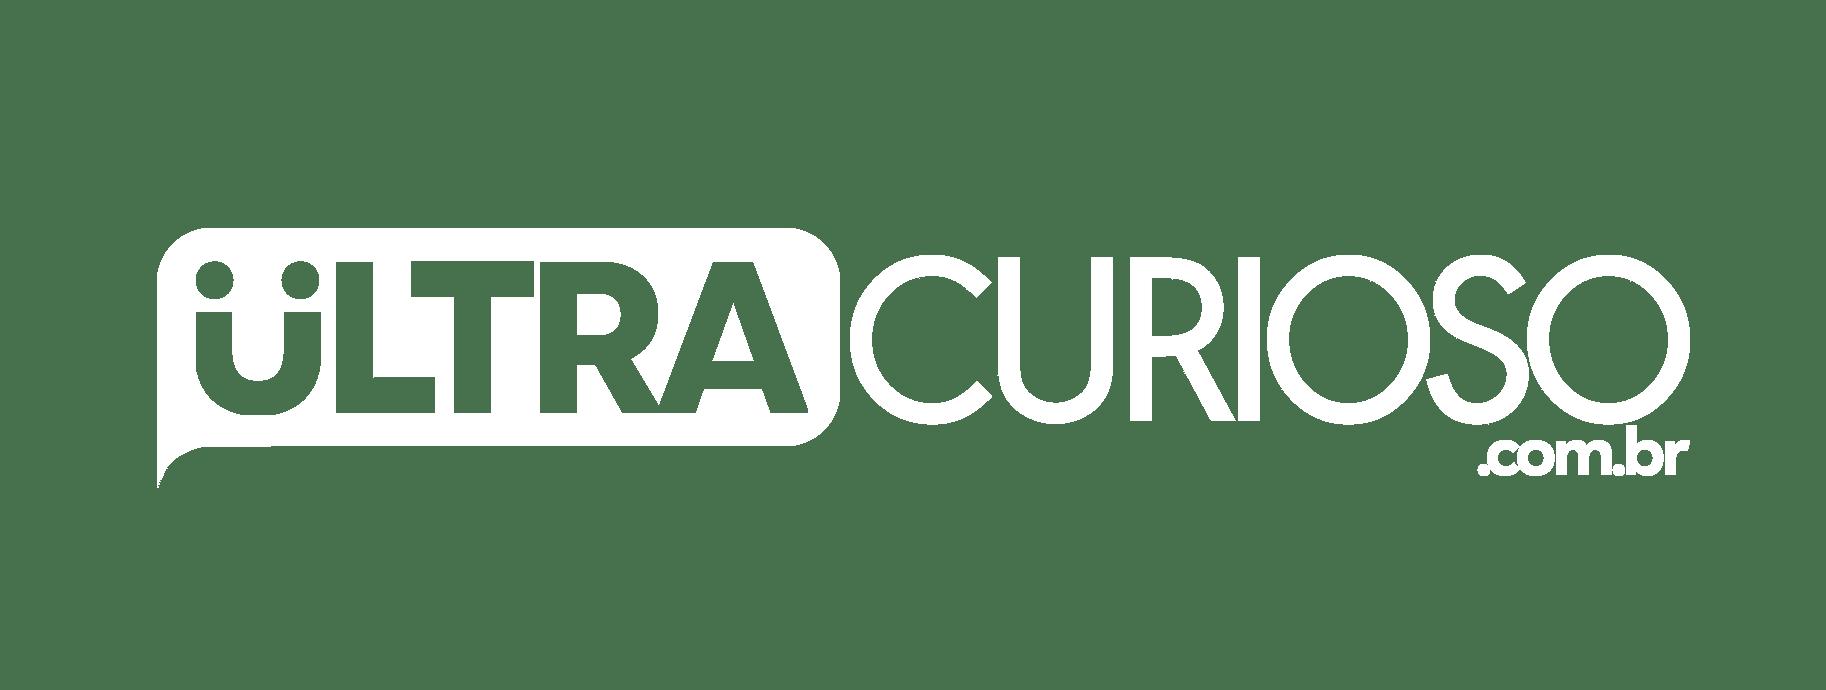 Ultracurioso